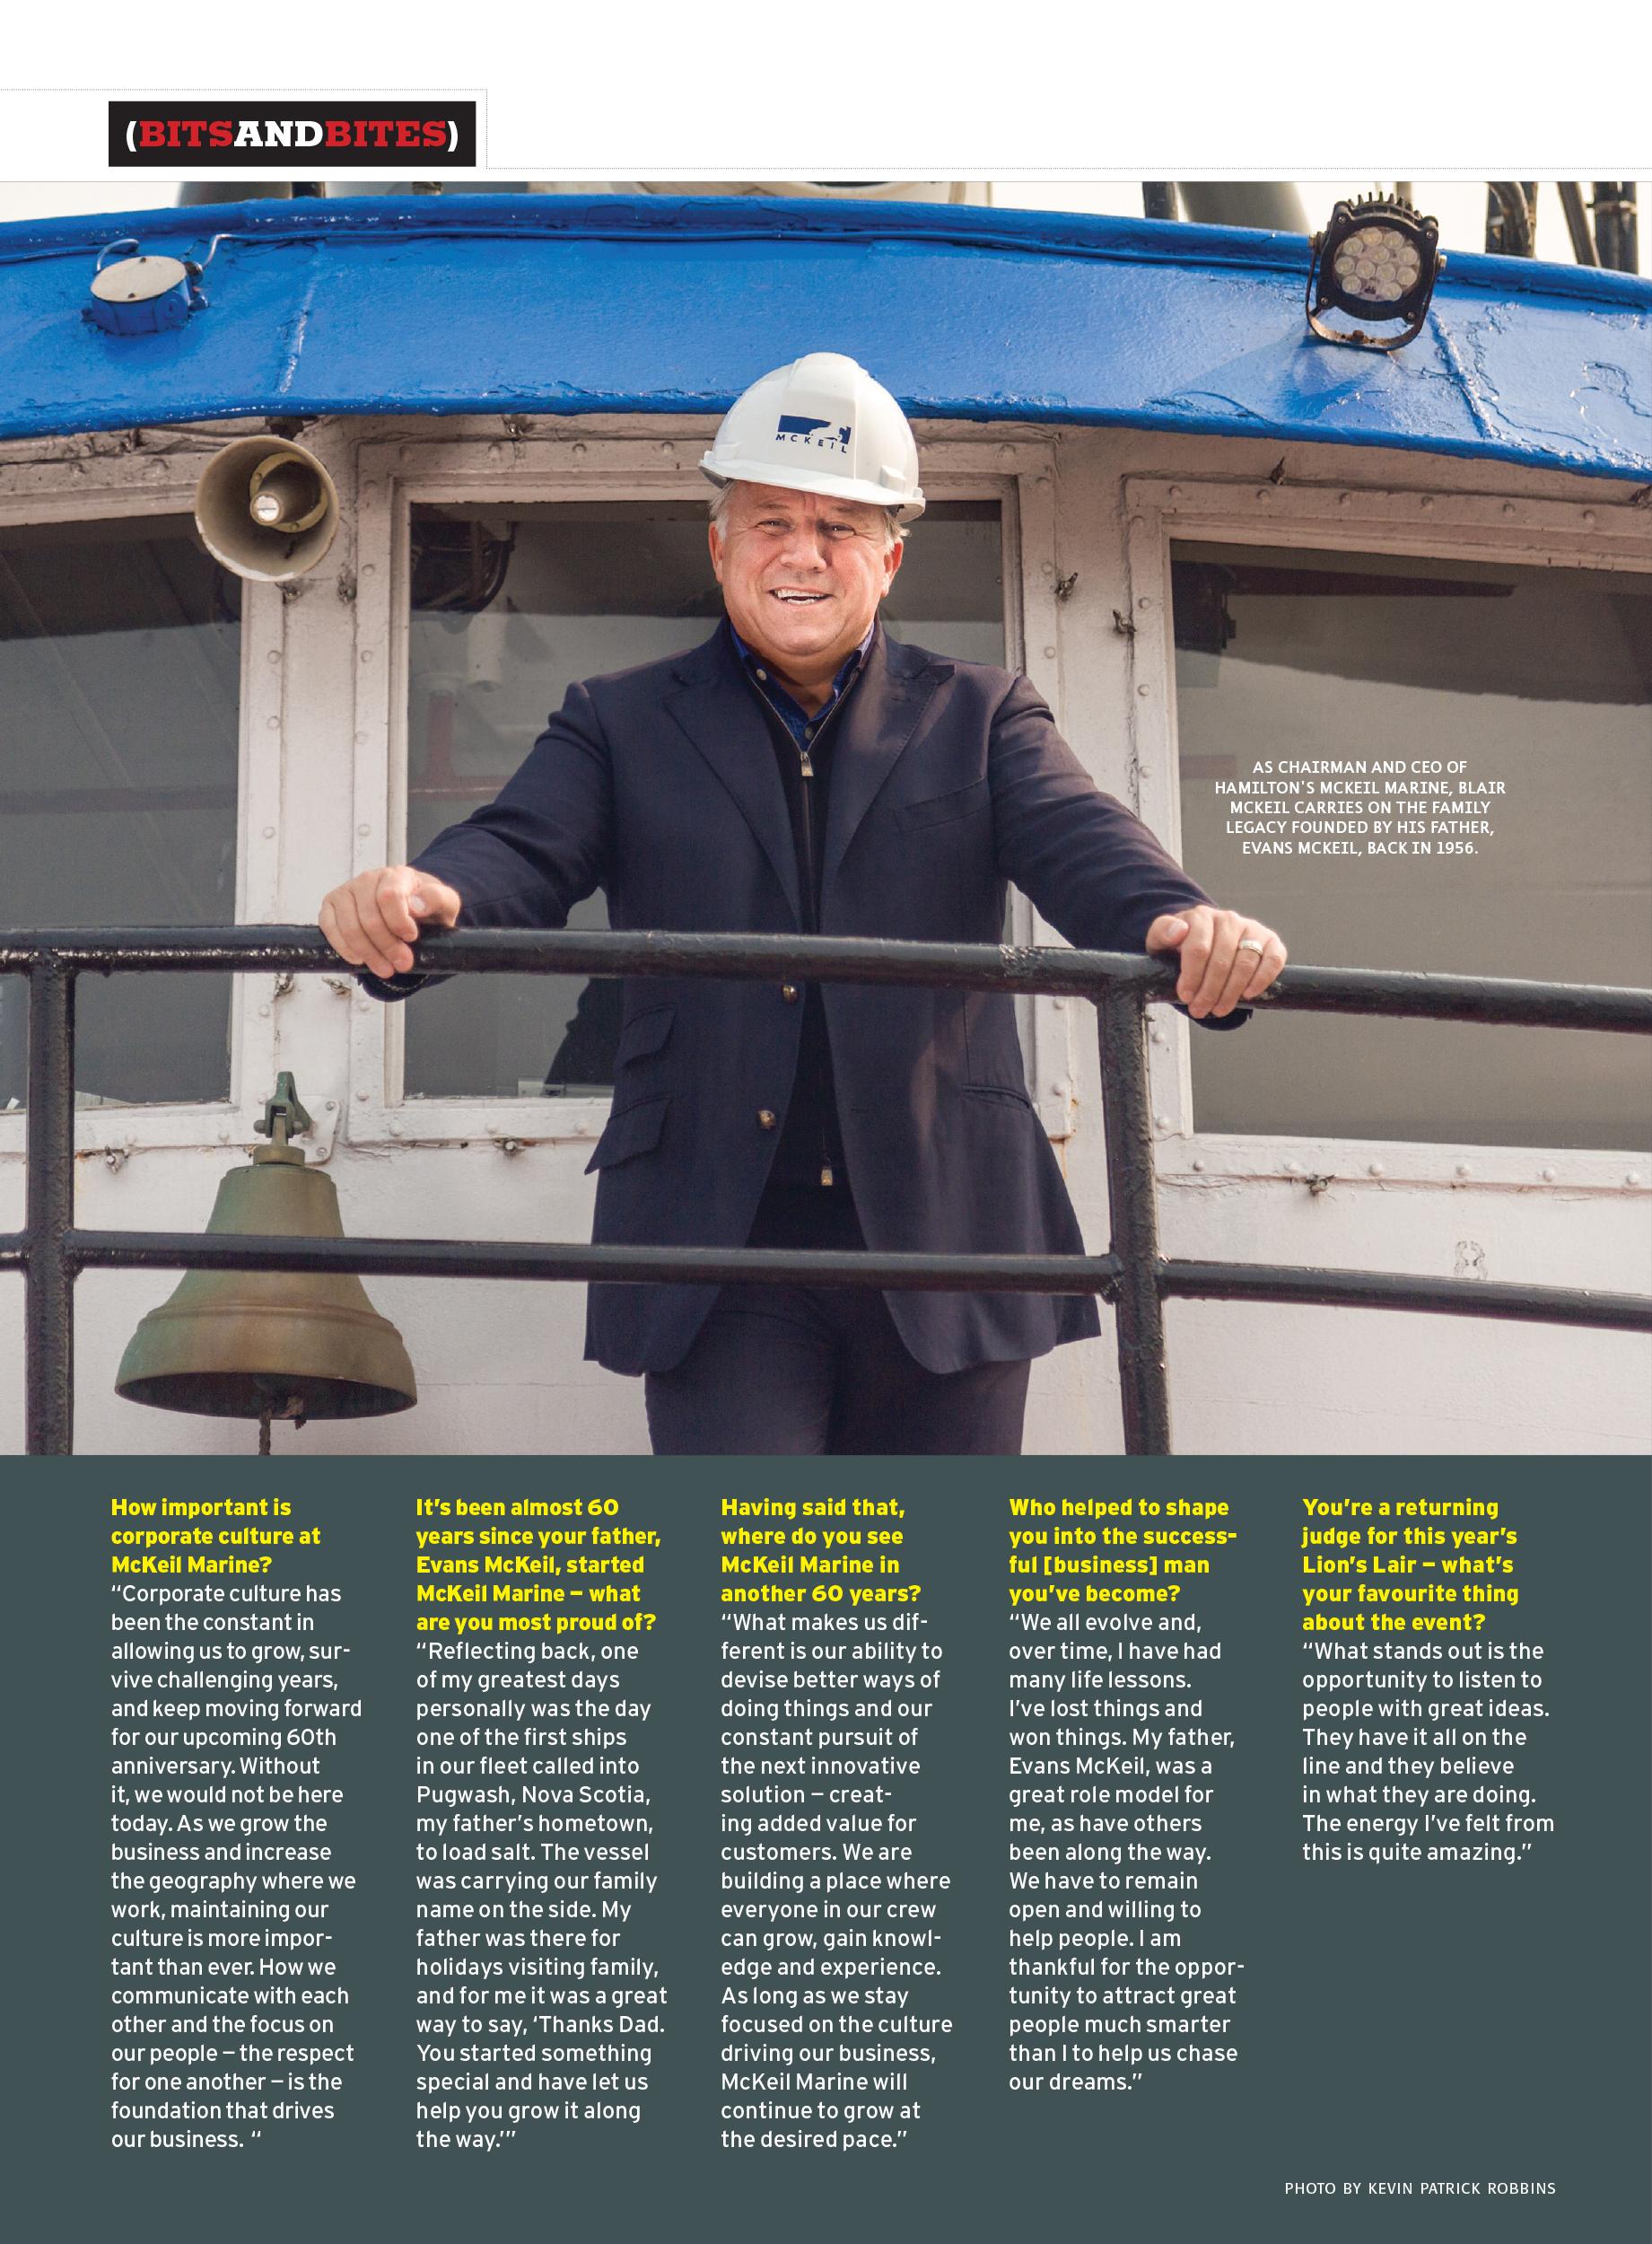 2014-03-03-Toronto-Ontario-Canada-editorial-photography-portrait-business-Great-Lakes-marine-shipping-executive-Blair-McKeil-Biz-magazine-feature-by-Kevin-Patrick-Robbins-KPR.jpg